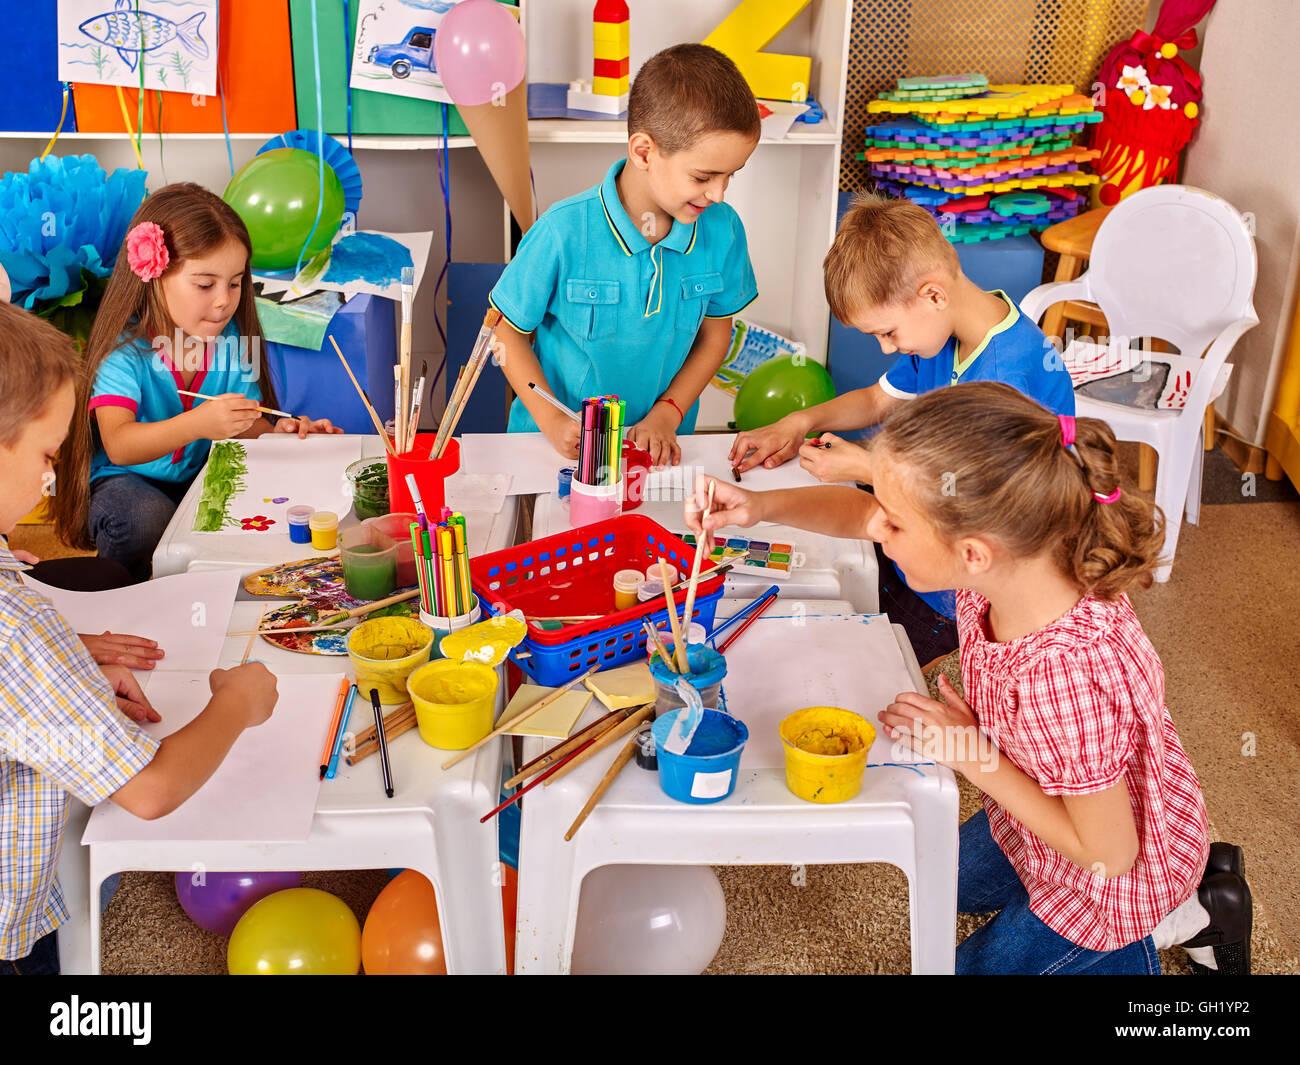 kindergarten teacher research paper Research paper on kindergarten teacher, legal essay writing service, military homework help.